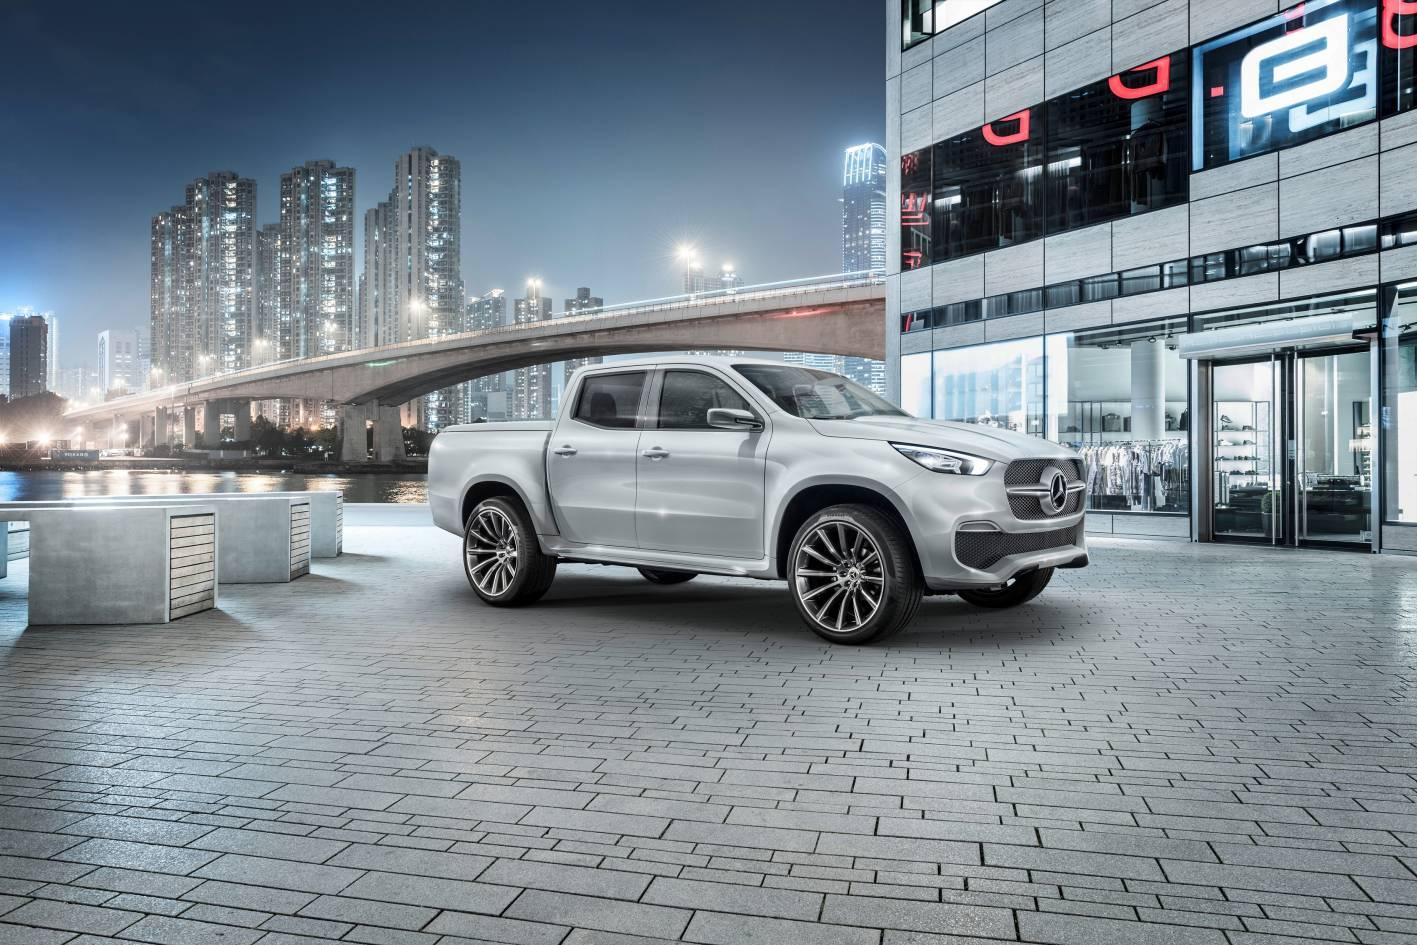 Nissan Navara Ute Review (2017 Update) — Auto Expert by John Cadogan